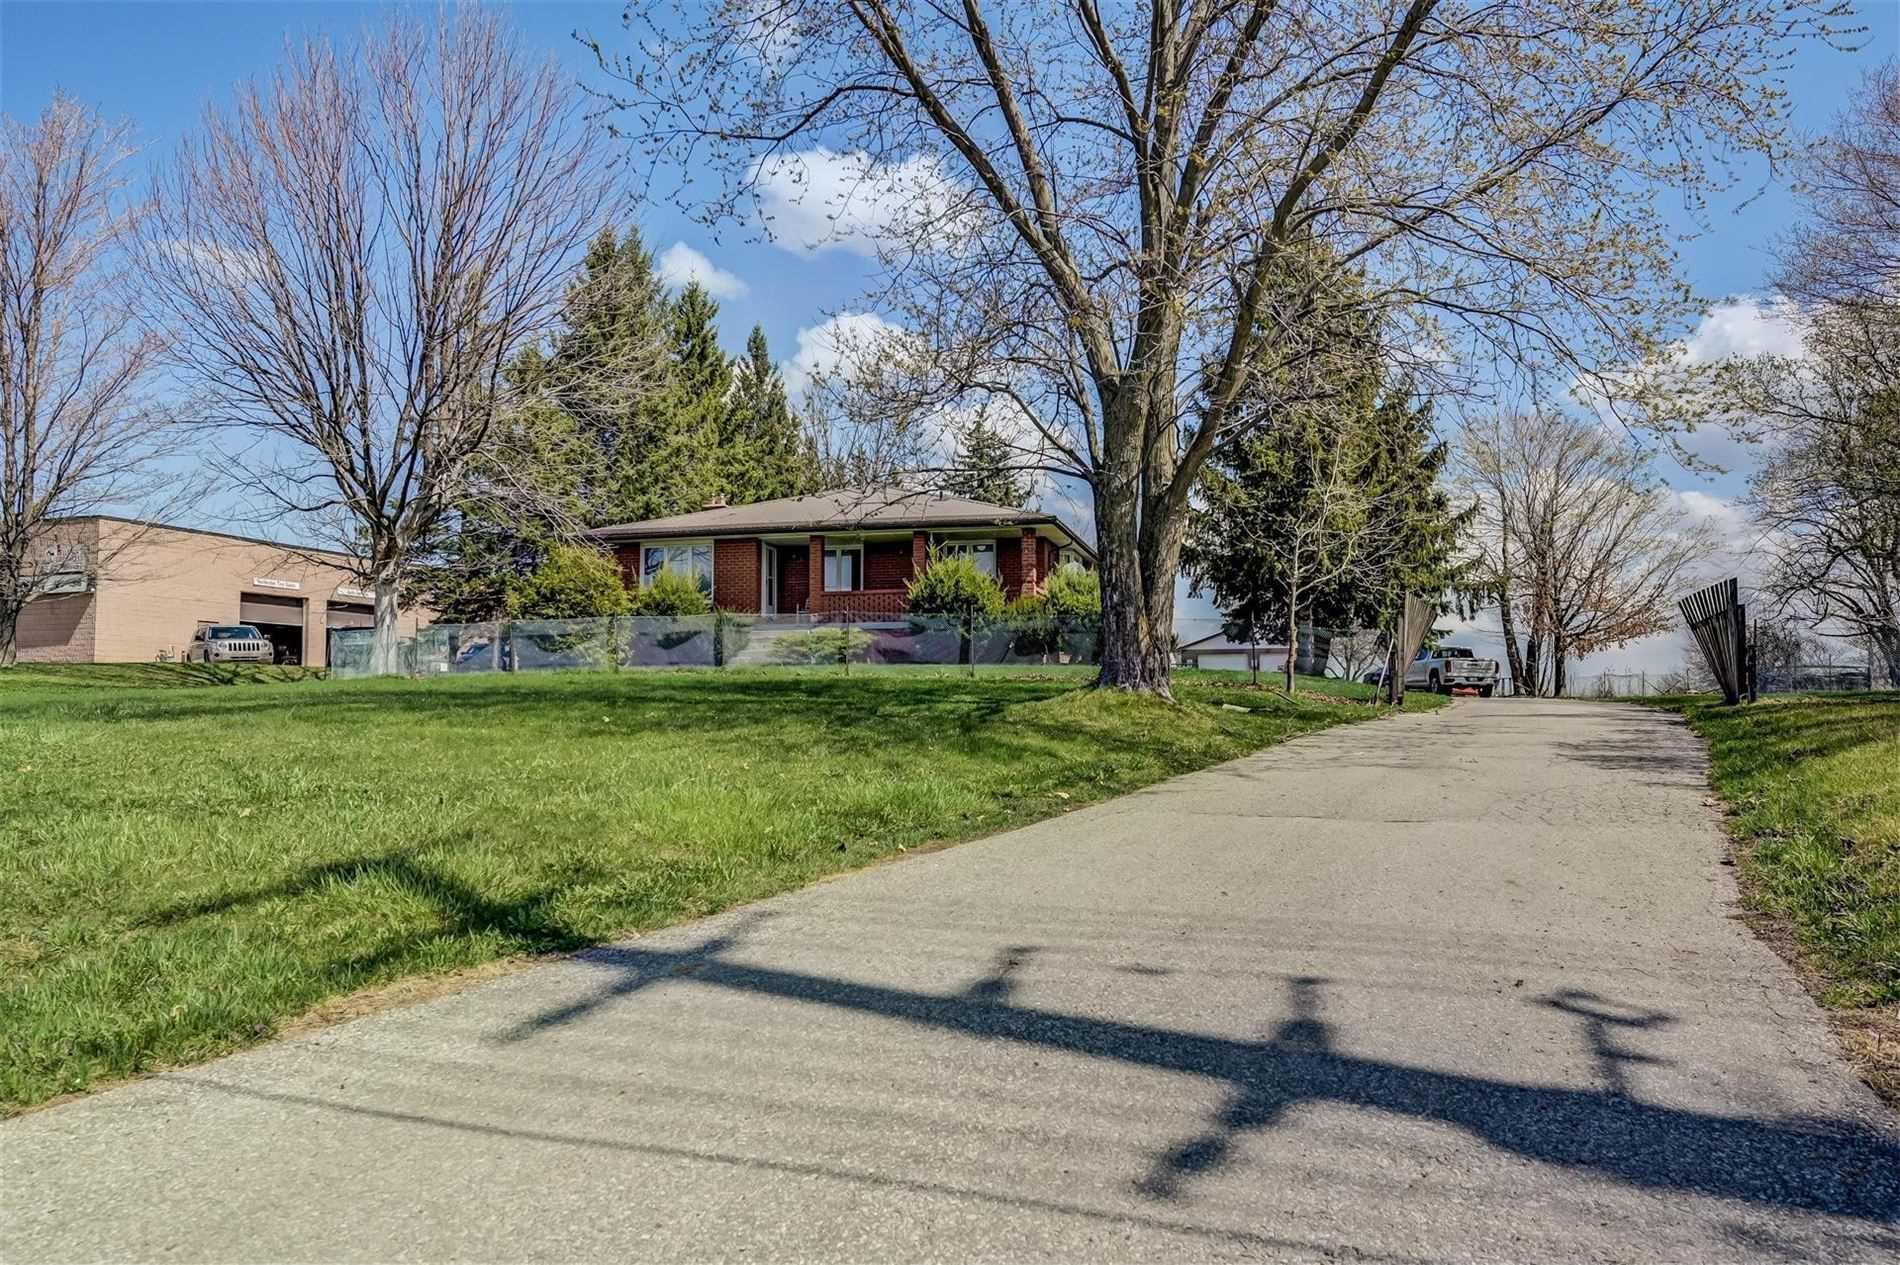 Detached house For Sale In Georgina - 24657 Woodbine Ave, Georgina, Ontario, Canada L4P 3E9 , 2 Bedrooms Bedrooms, ,3 BathroomsBathrooms,Detached,For Sale,Woodbine